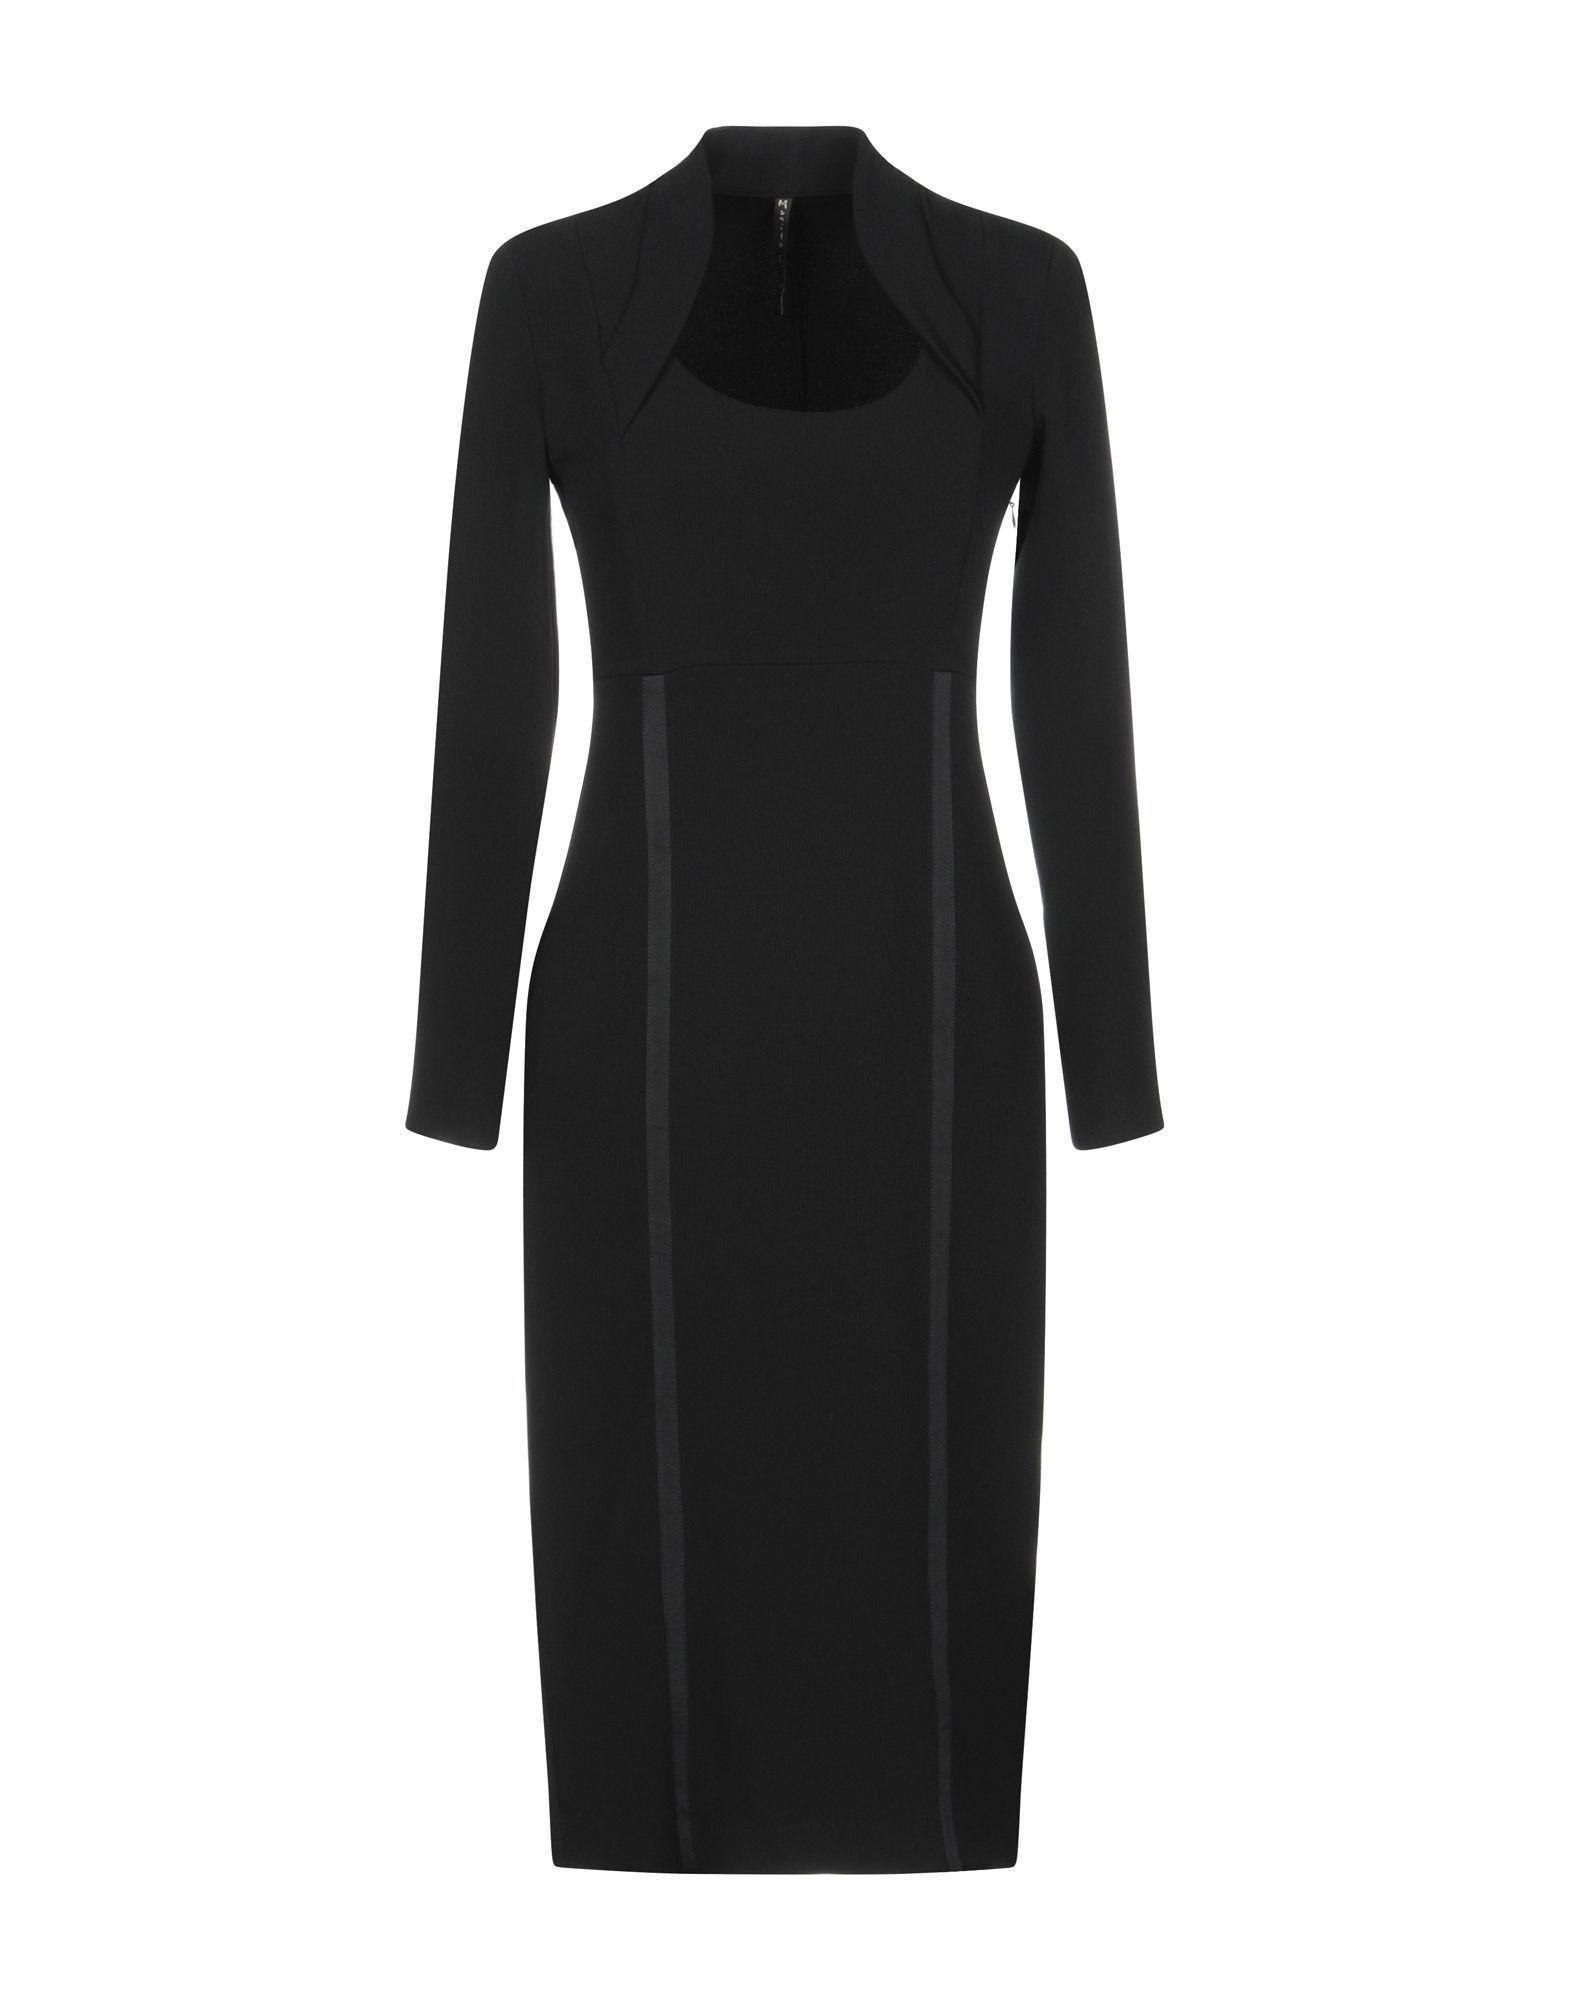 Manila Grace Black Crepe Long Sleeve Dress